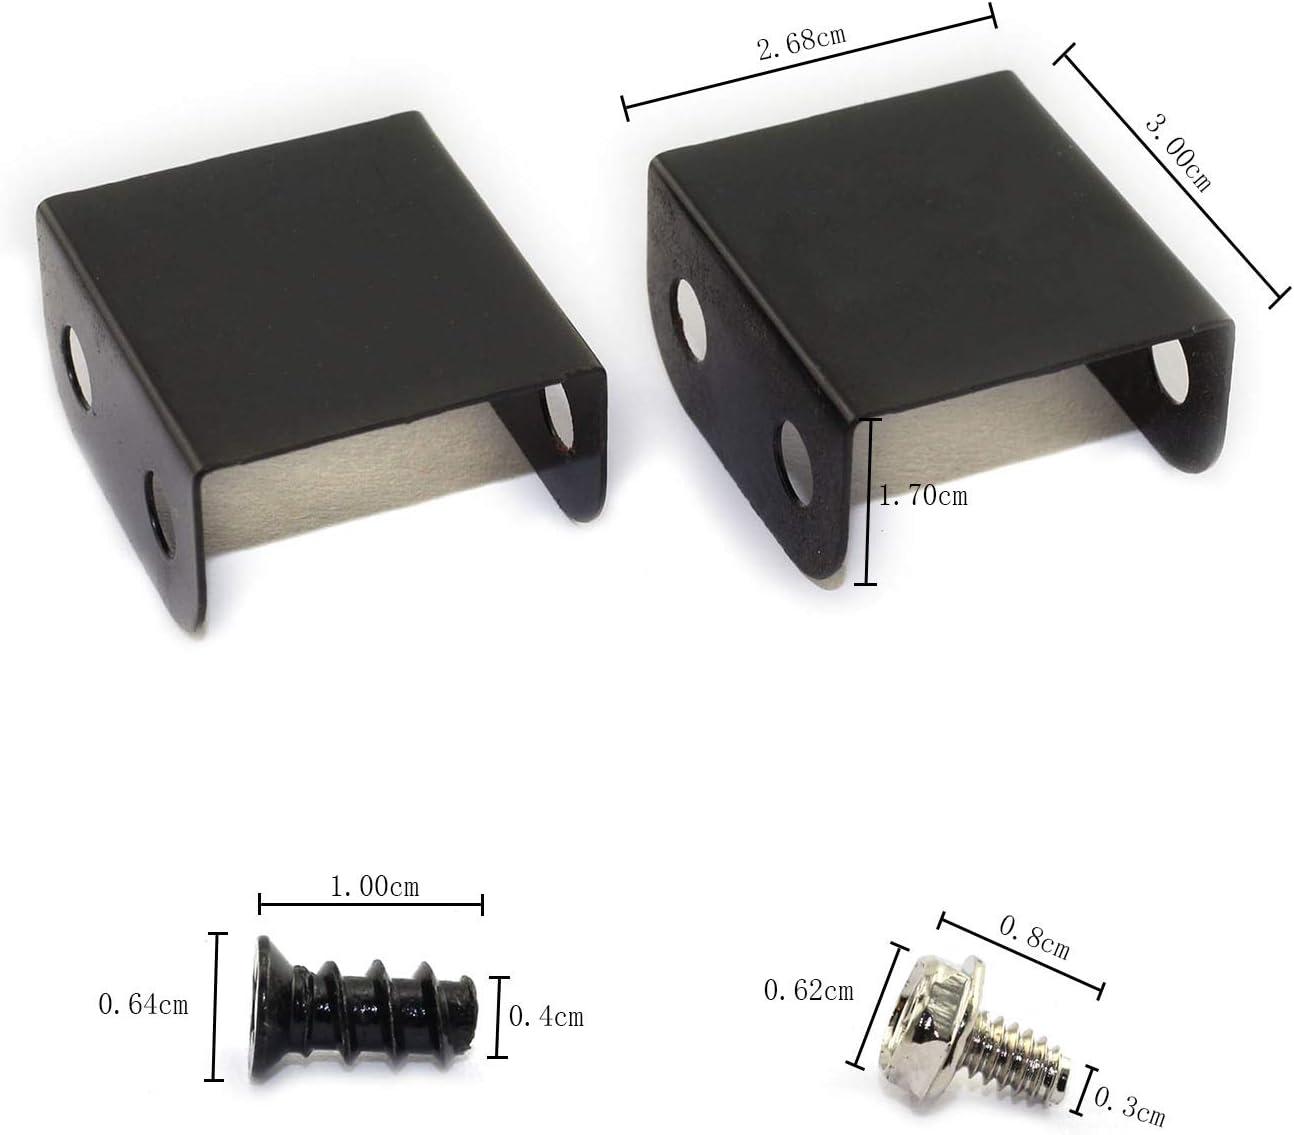 Maxmoral 1-Pack Dual Fan Mount Rack PCI Slot Bracket for Video Card DIY Support 9cm/12cm Fan Computer Radiator Holder